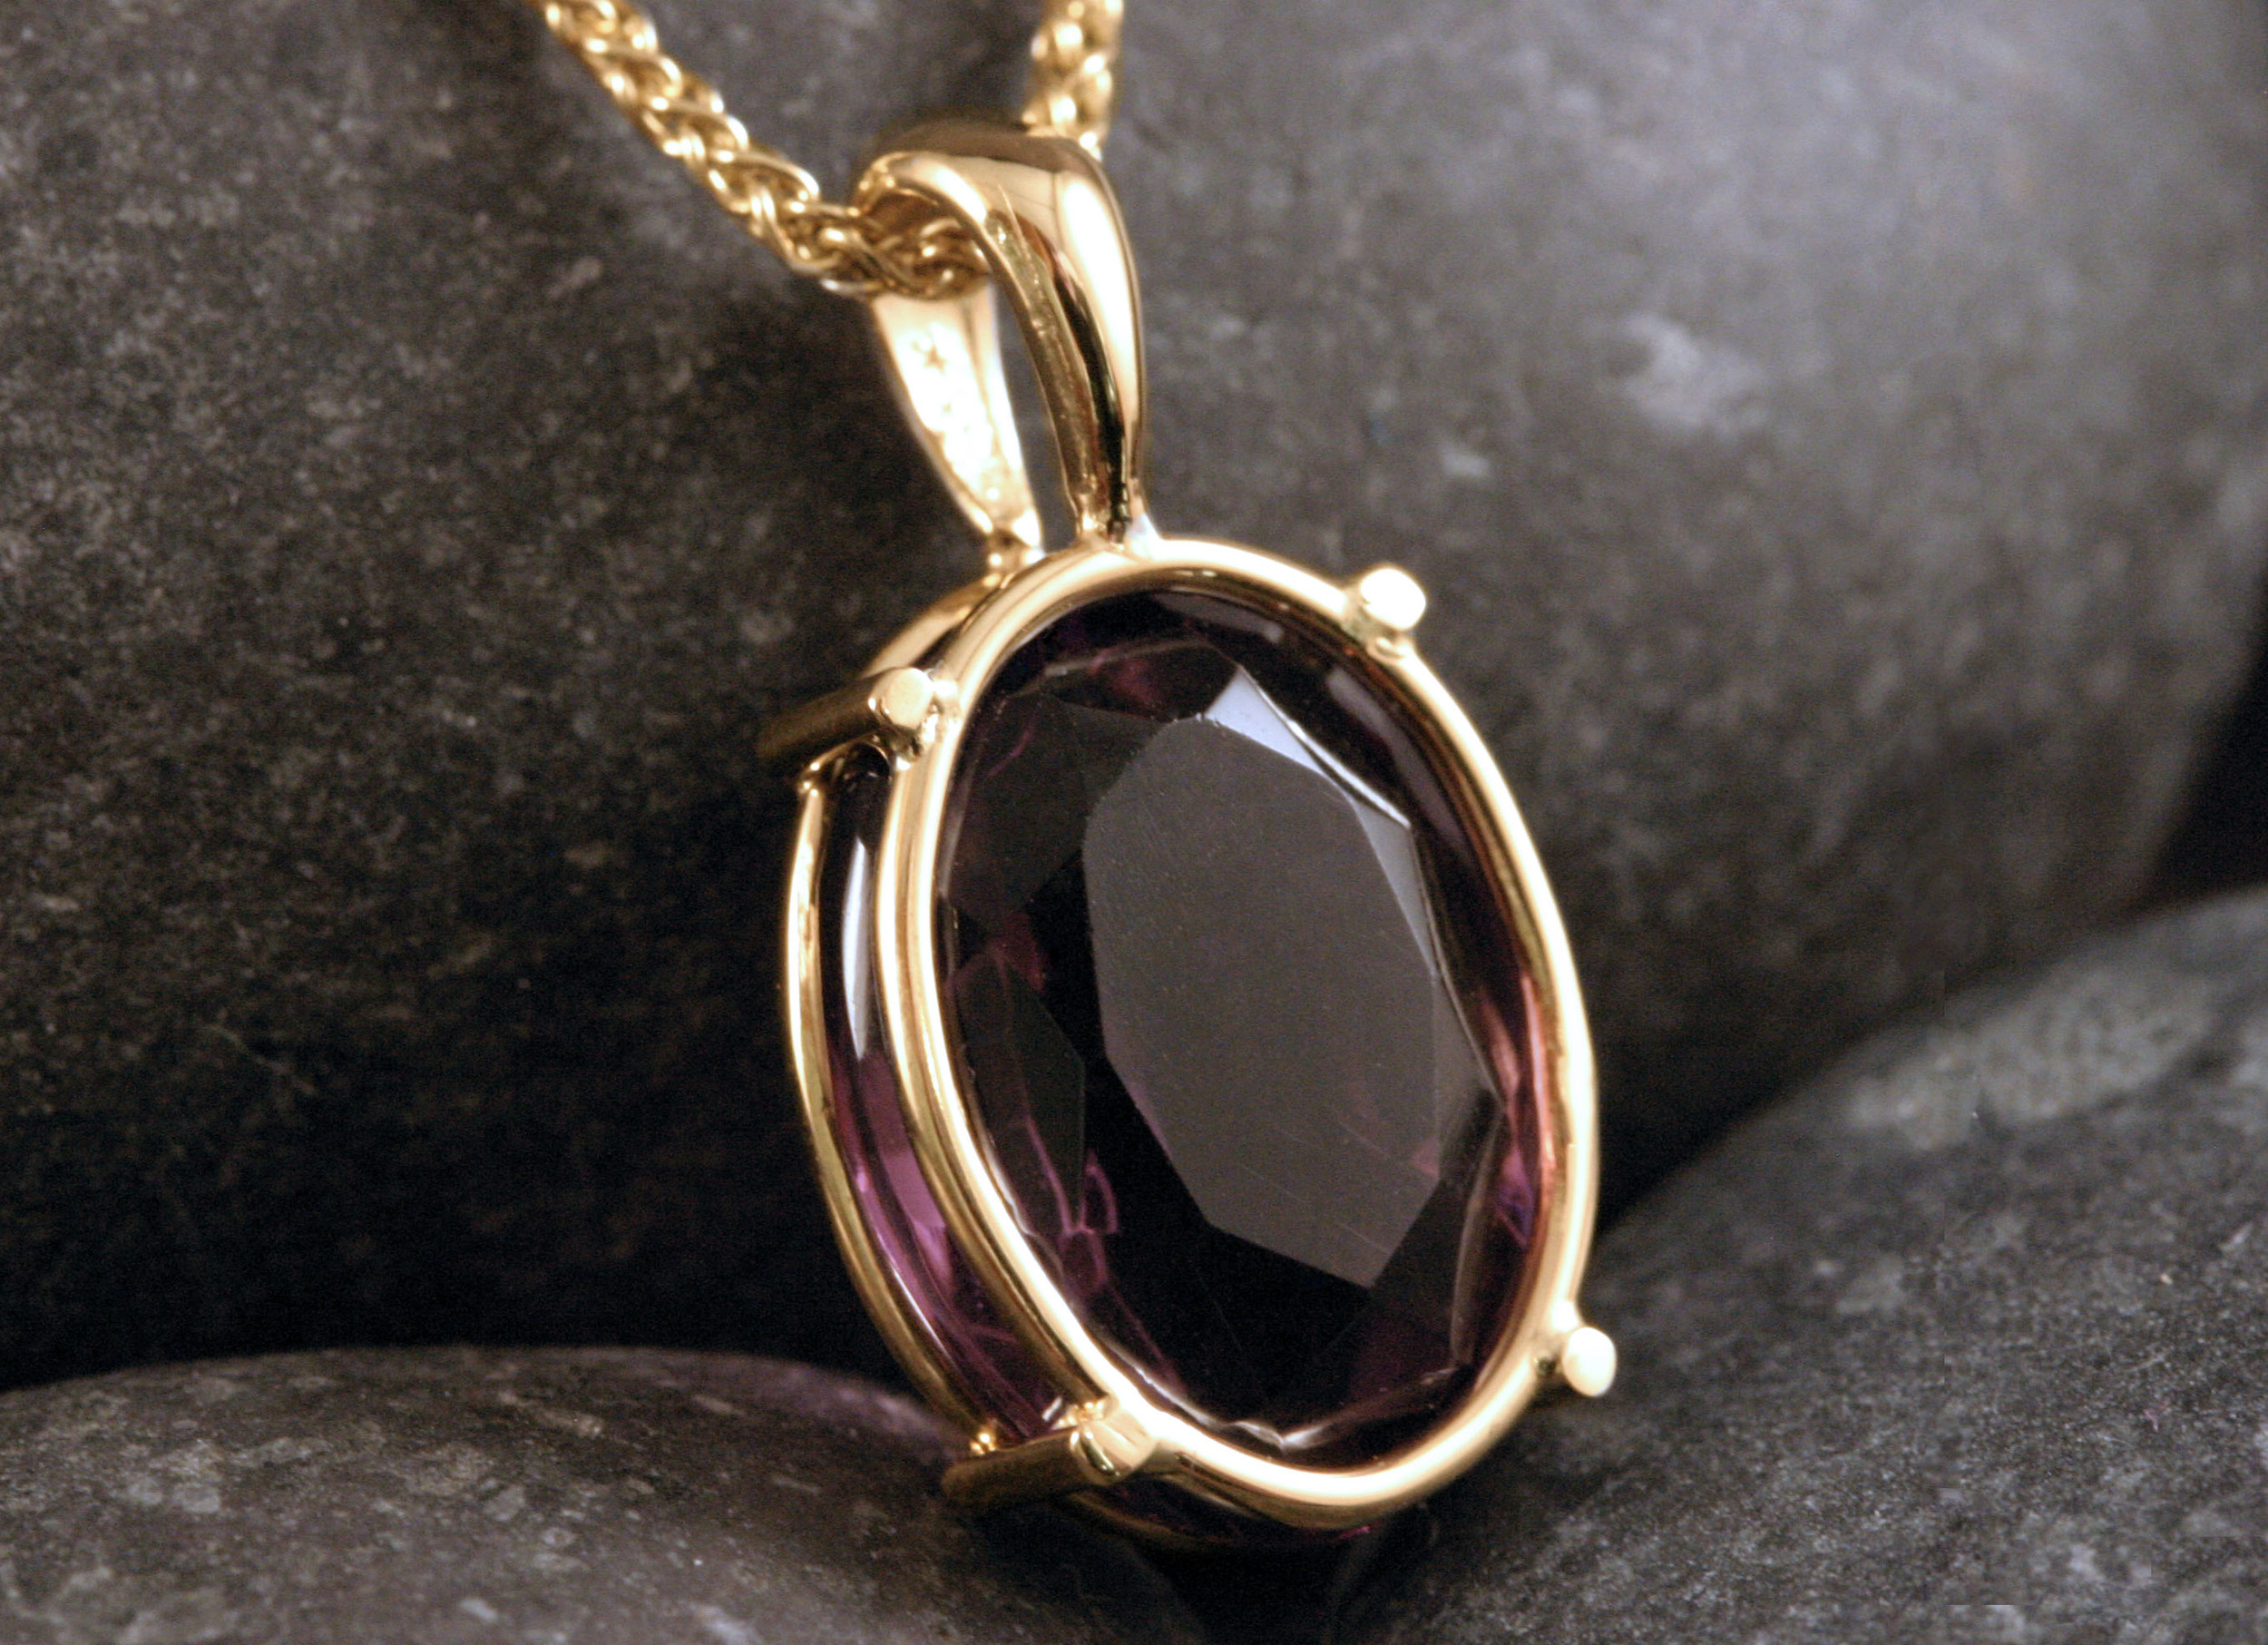 A 14K gold & amethyst pendant.